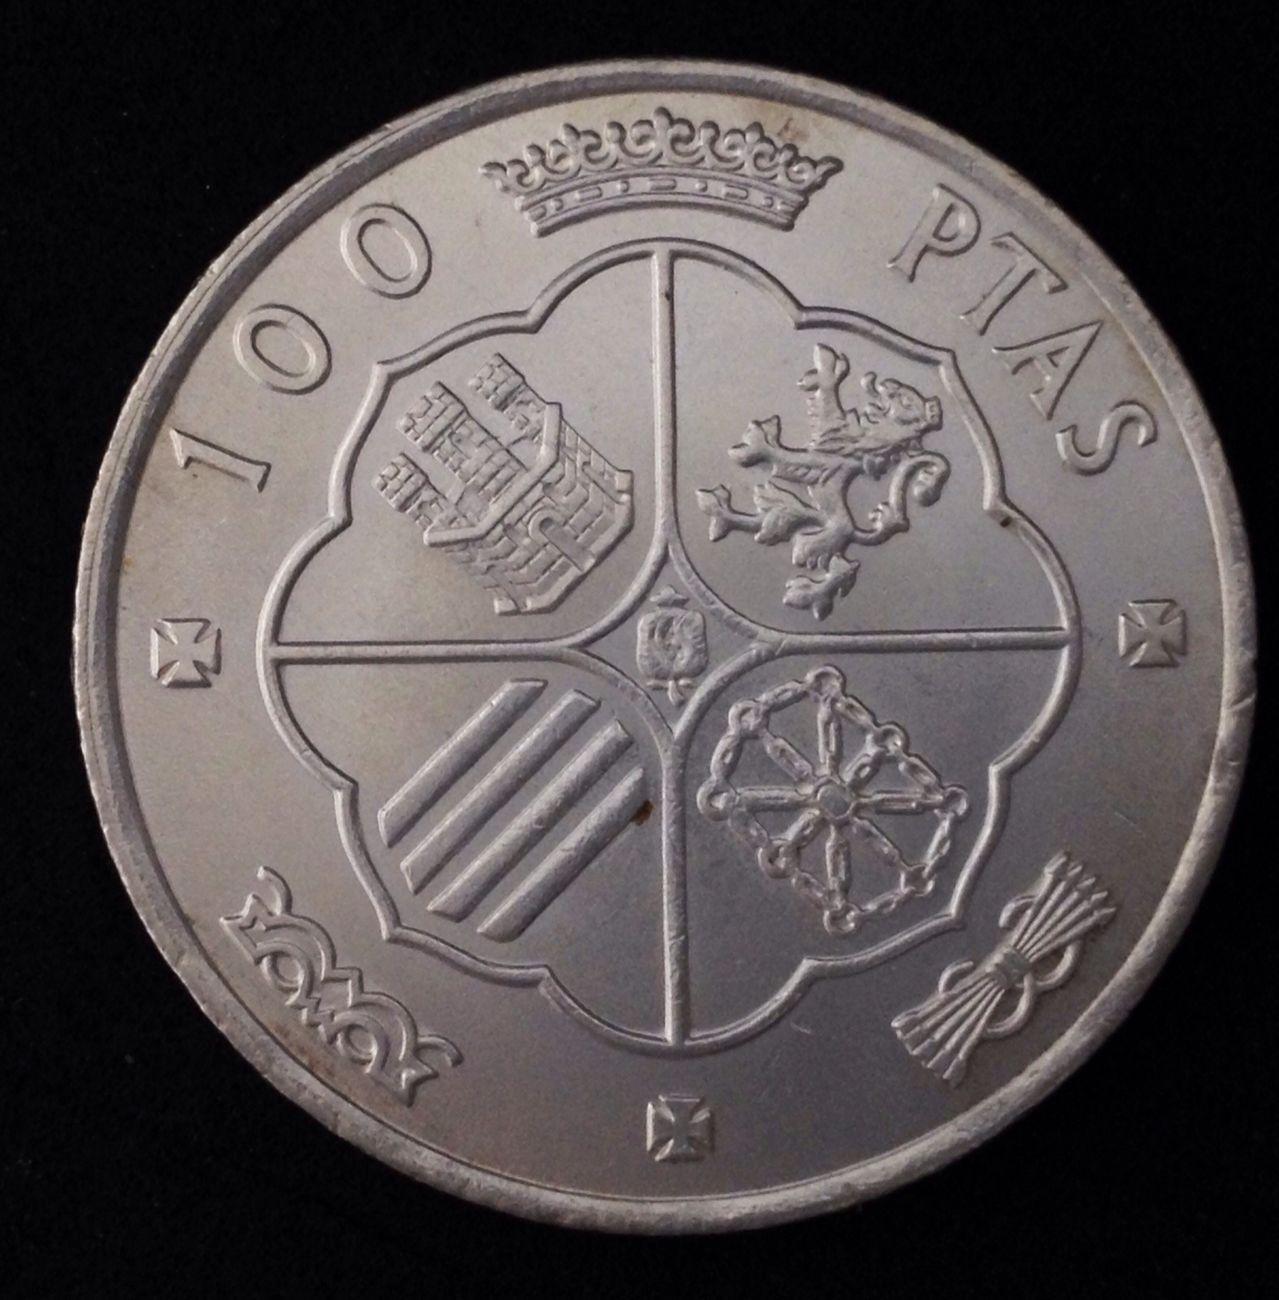 100 pesetas 1966 *66. Estado Español. Image